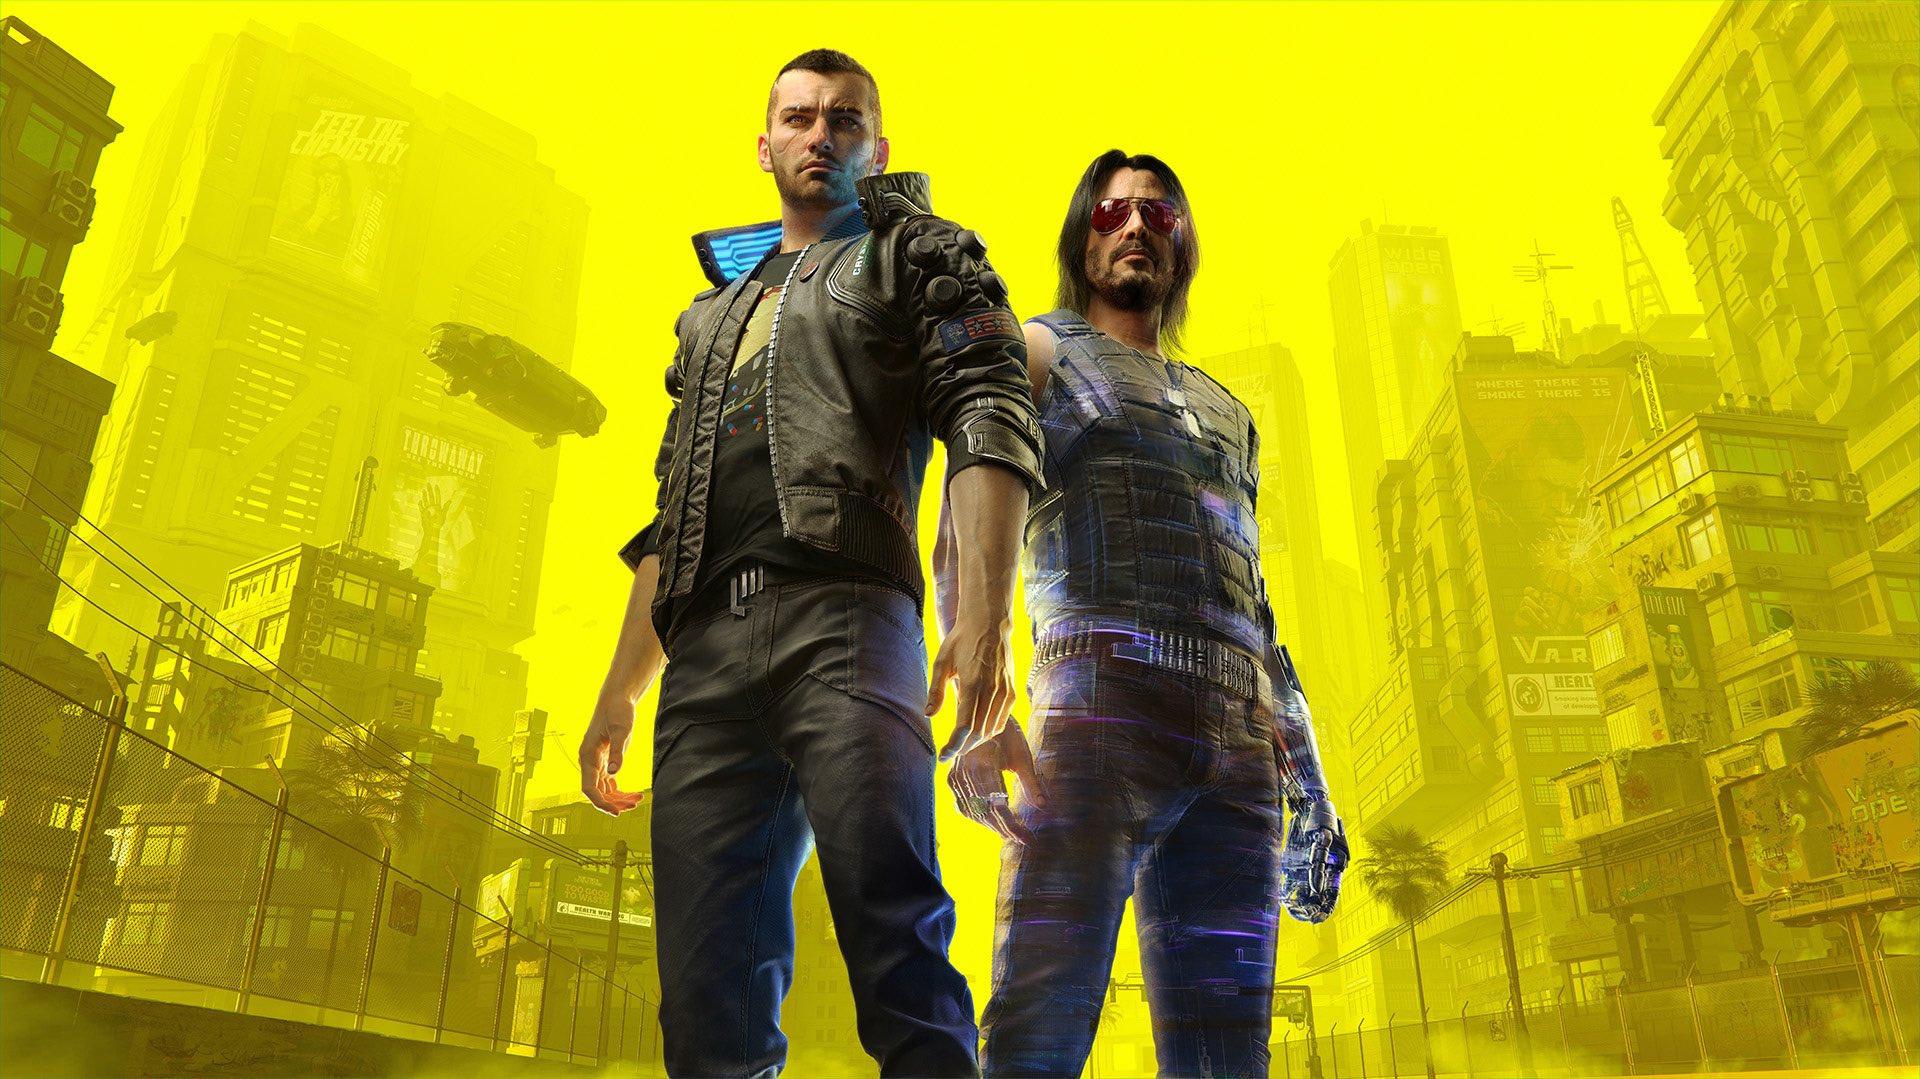 Cyberpunk 2077, похоже, возвращается в PlayStation Store